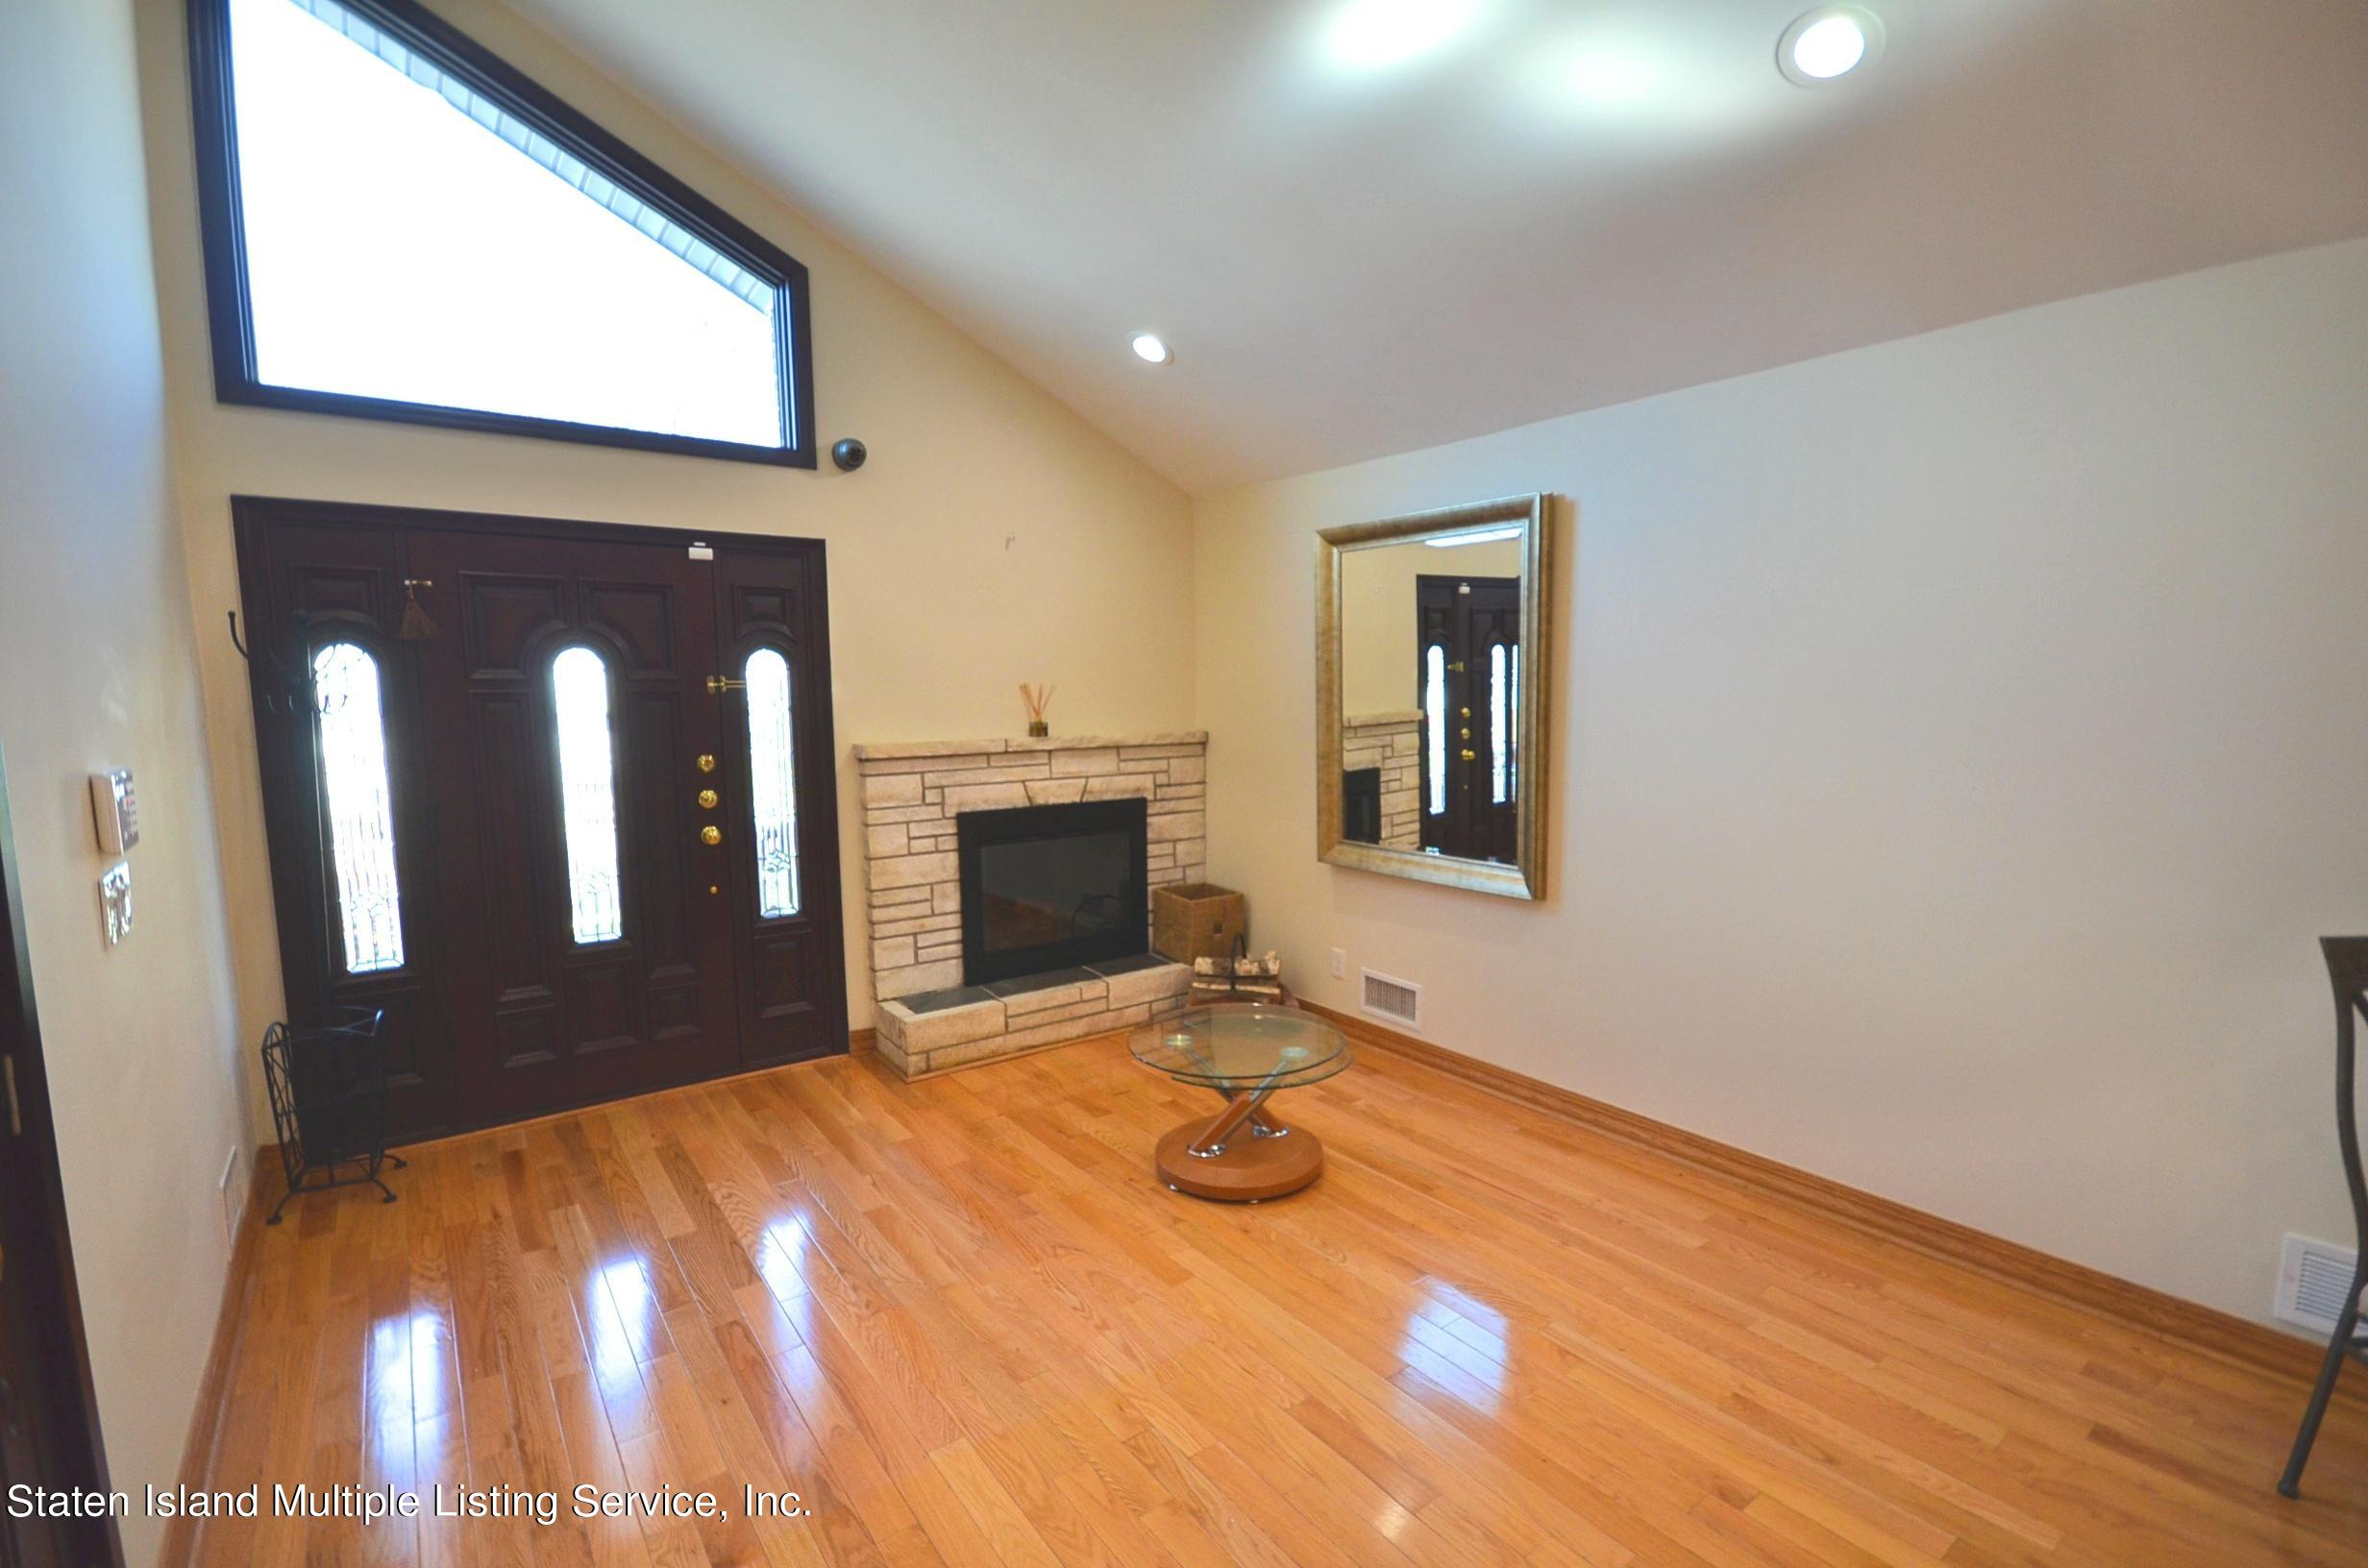 Single Family - Detached 48 Ocean Terrace  Staten Island, NY 10314, MLS-1142240-8